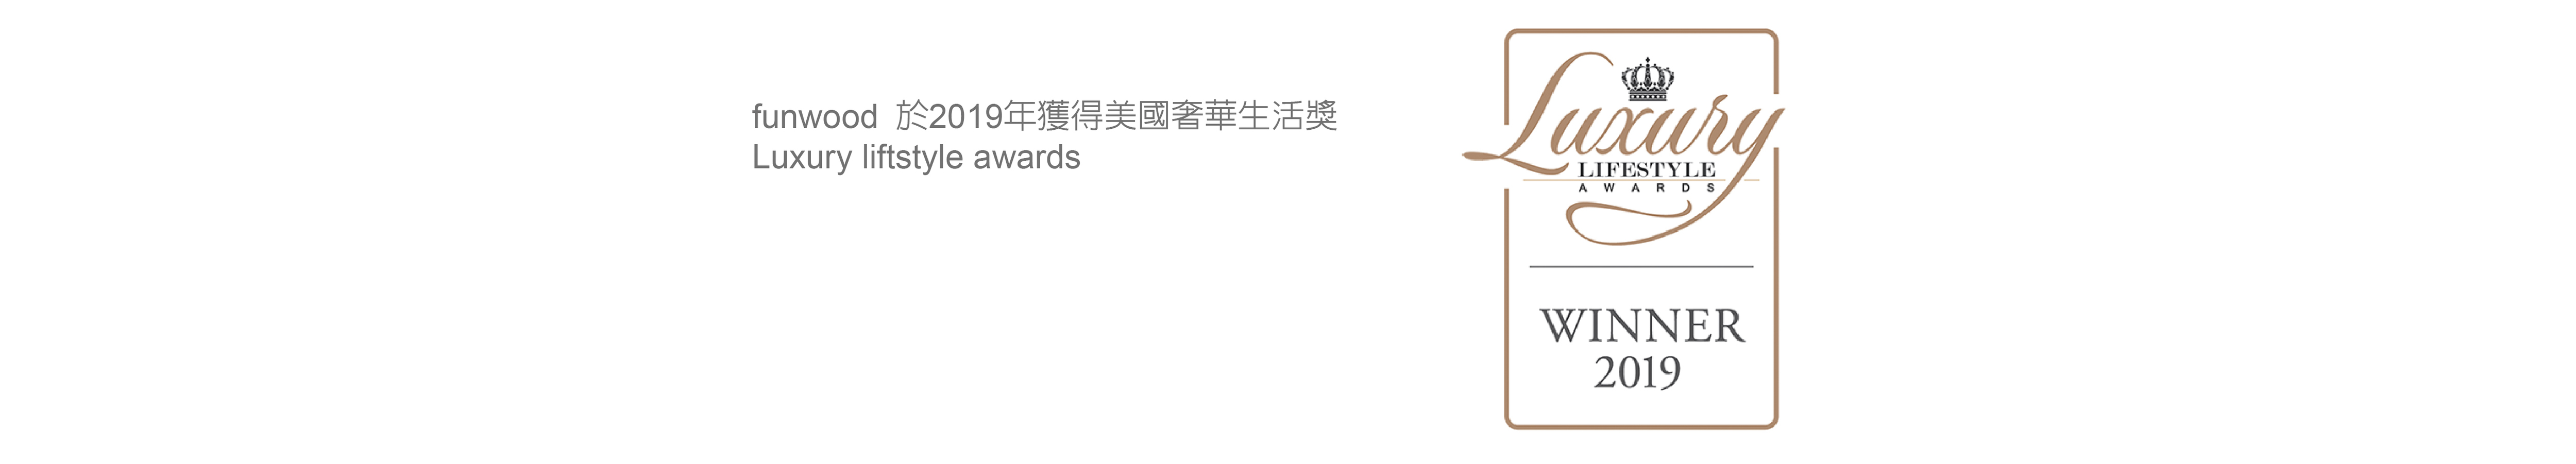 Luxury liftstyle awards 、美國奢華生活獎